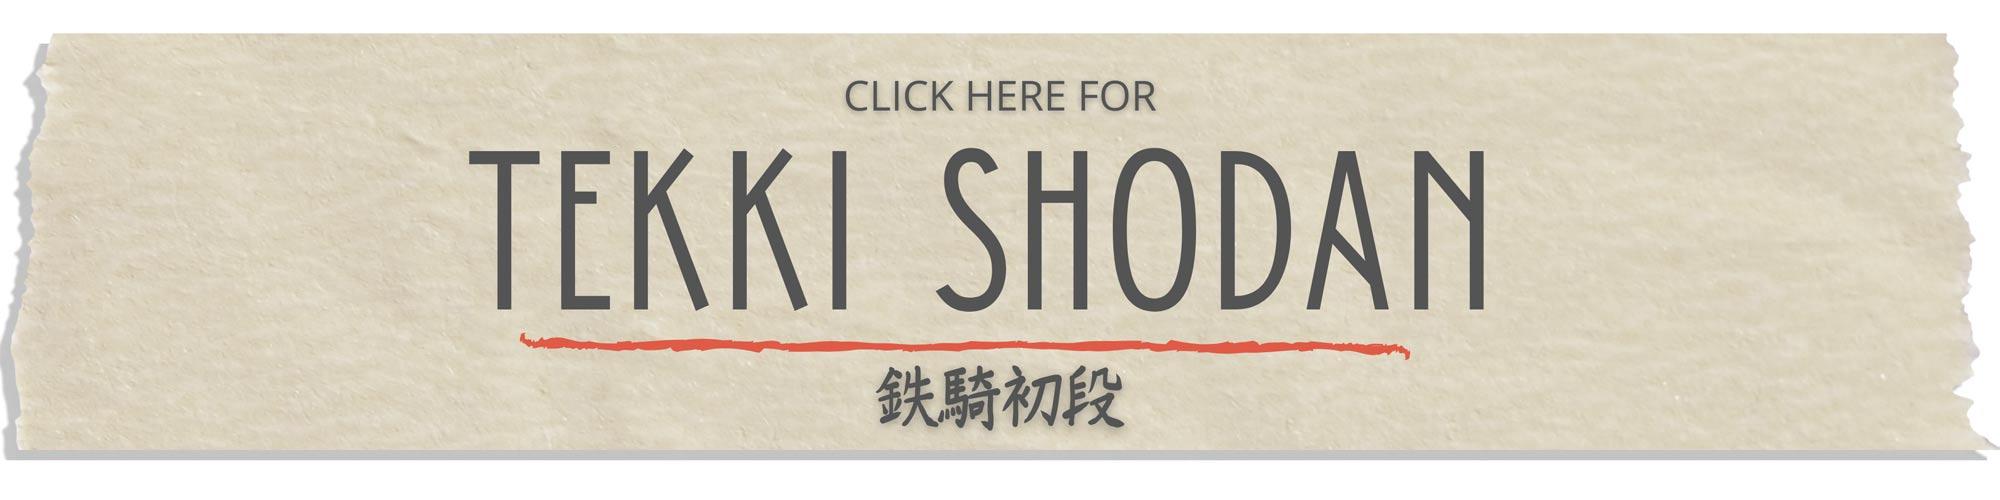 tekki shodan tutorial step by step